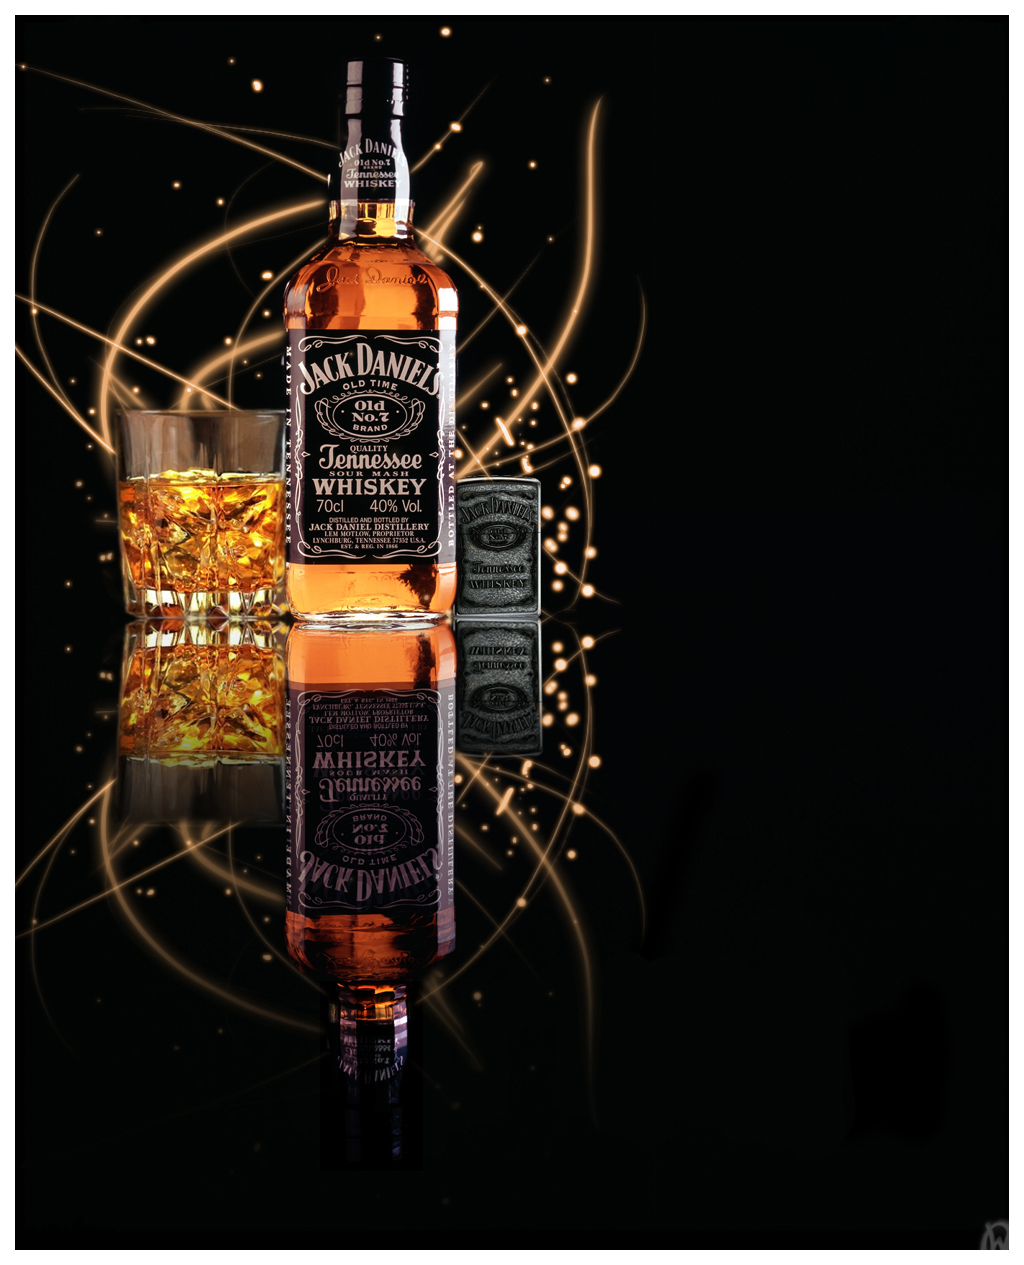 Wallpapers del Whiskey Jack Daniels   Taringa 1024x1265